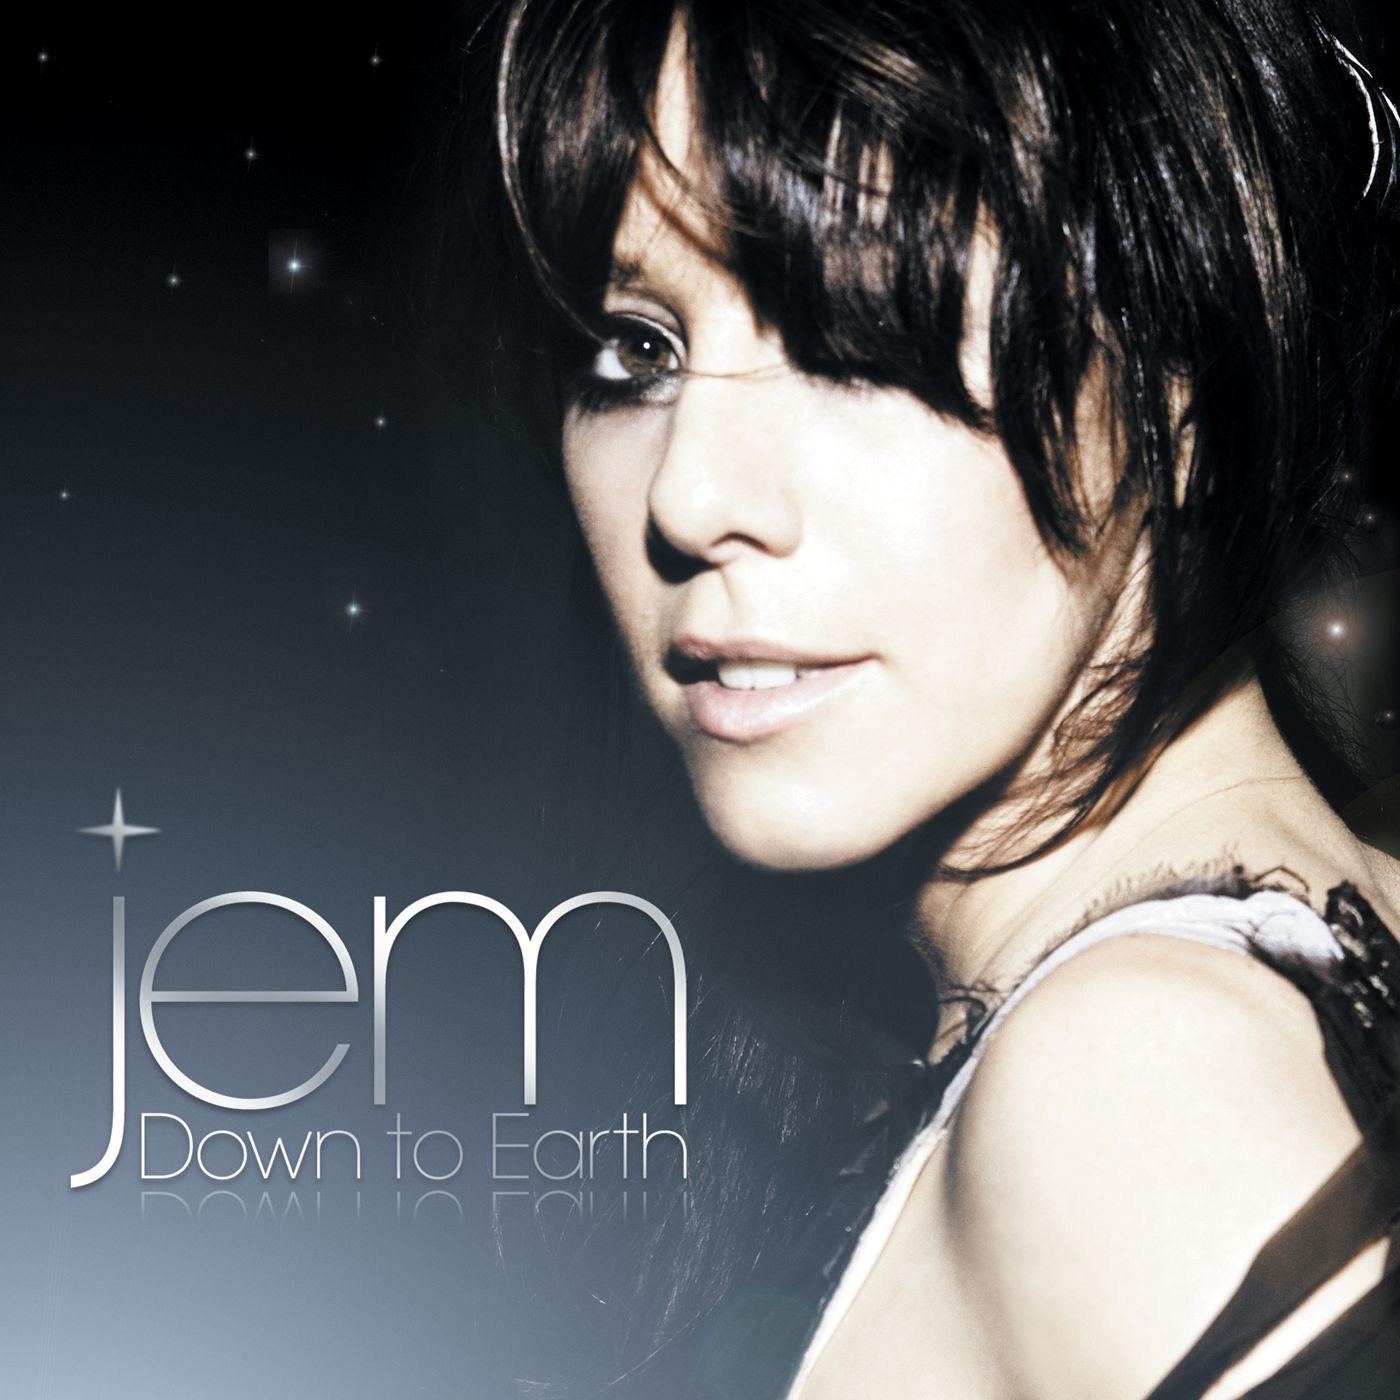 Jem album Down to Earth